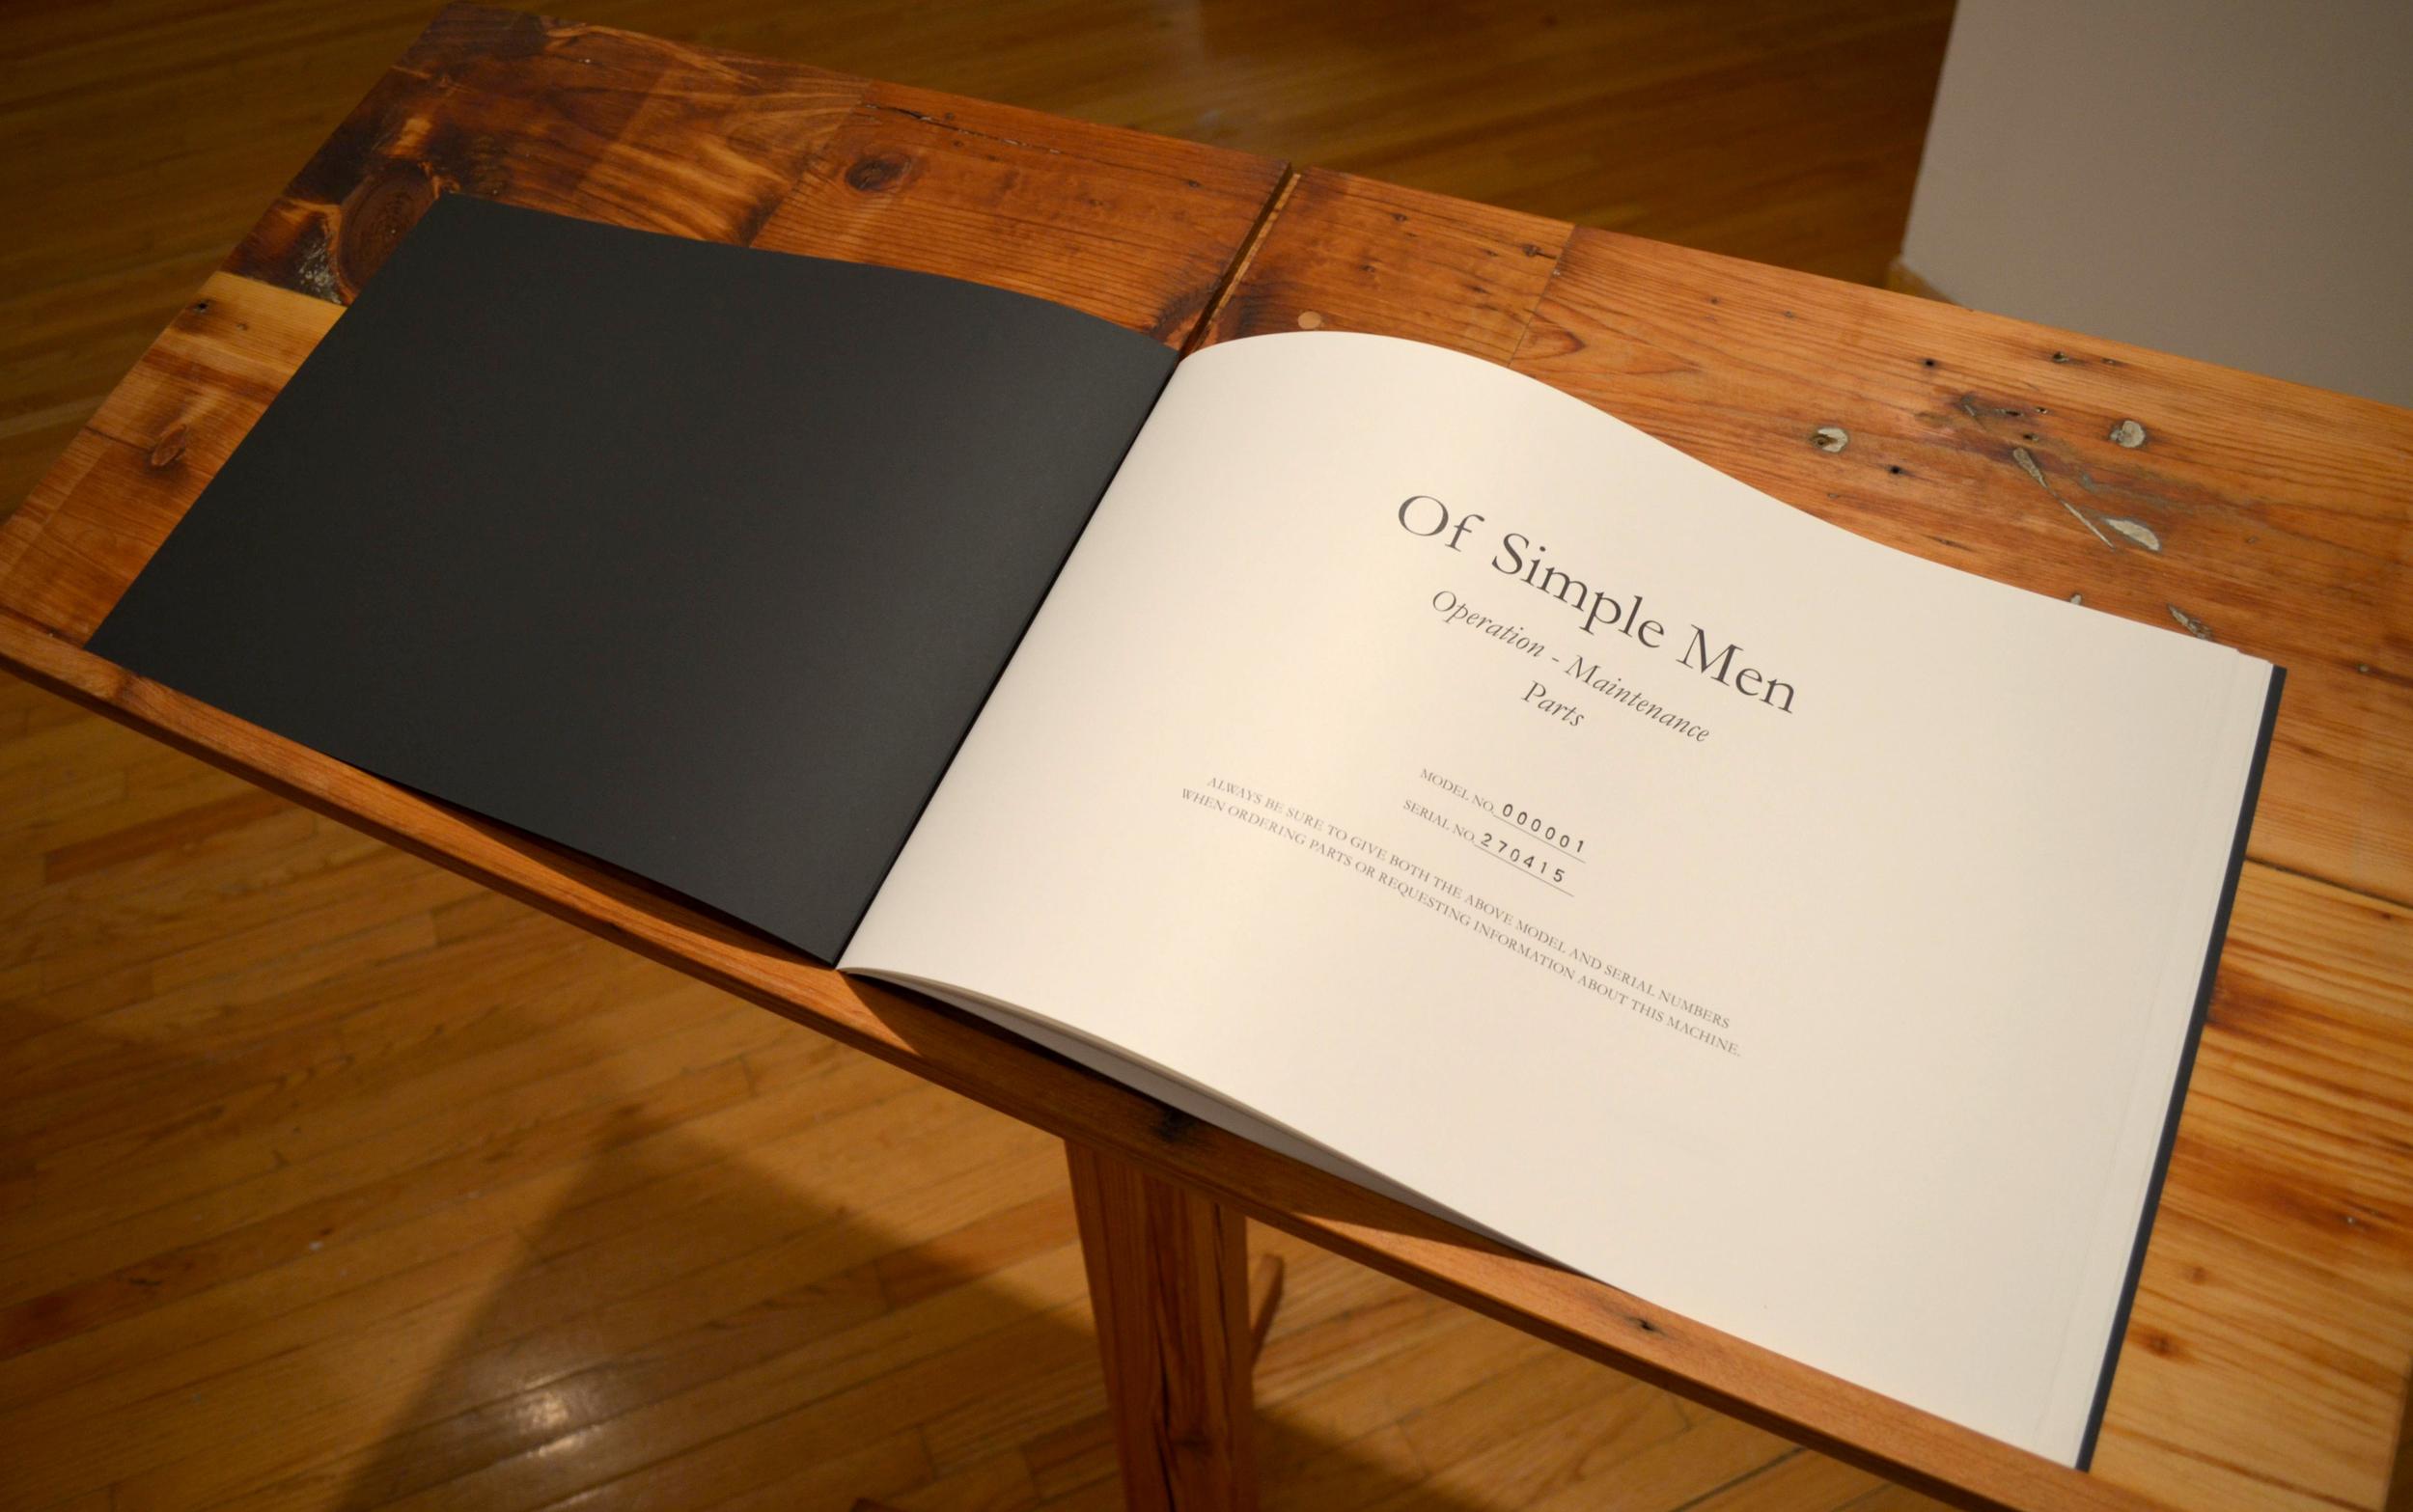 Of Simple Men: Operation - Maintenance - Parts